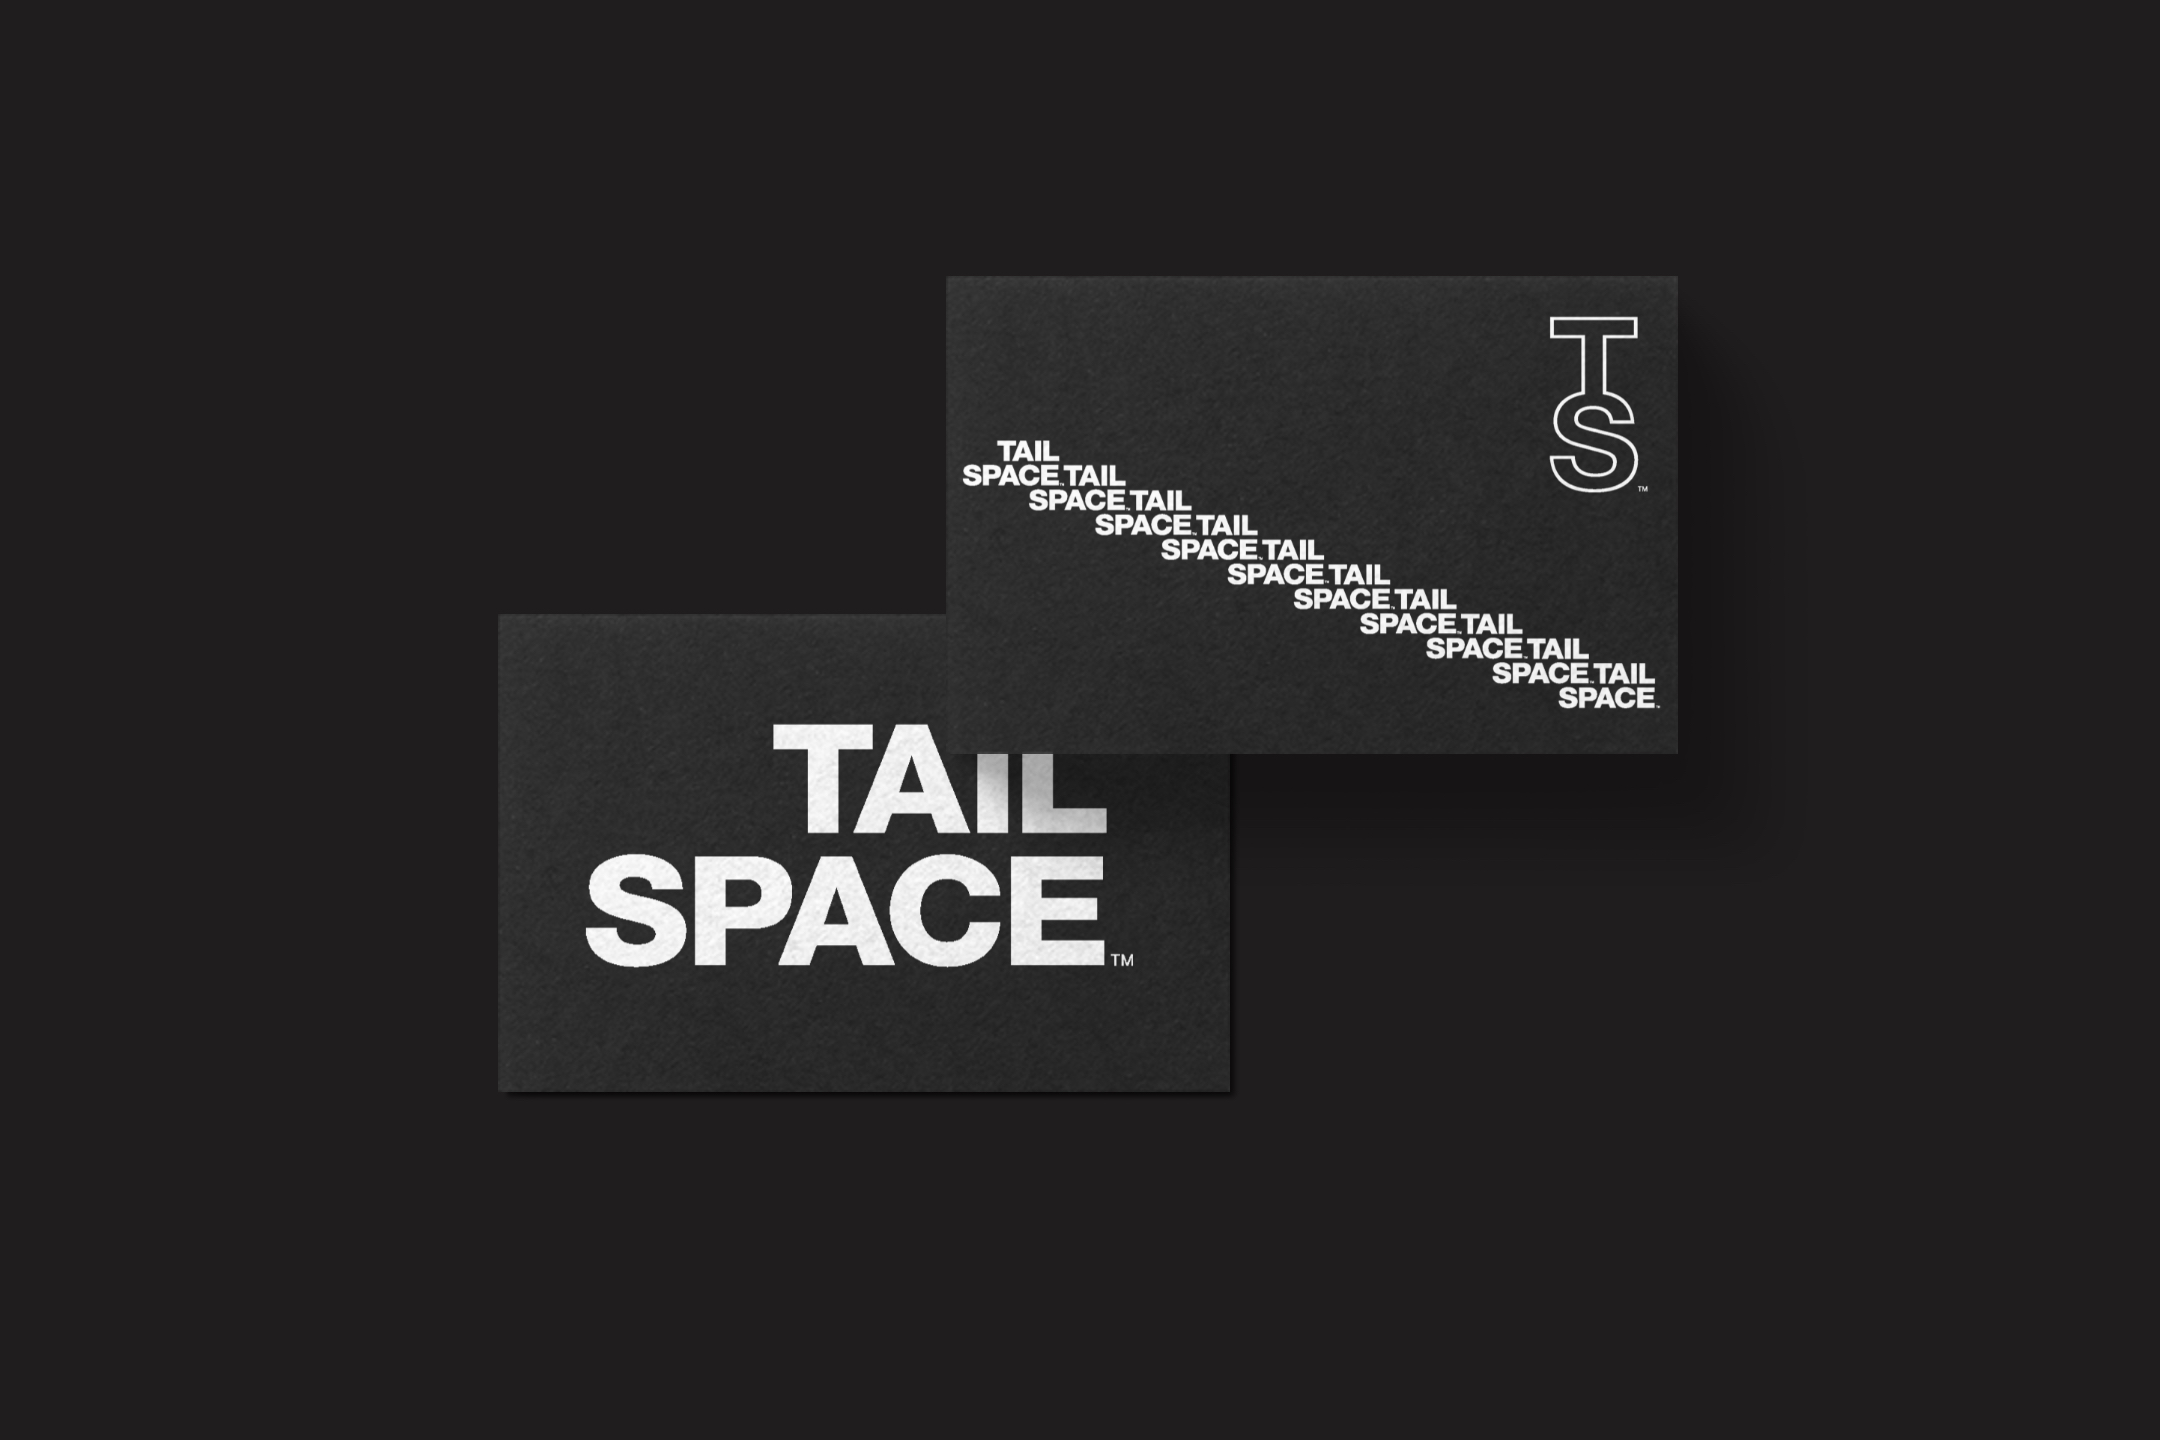 tail-space_card_2_2-black160w.jpeg